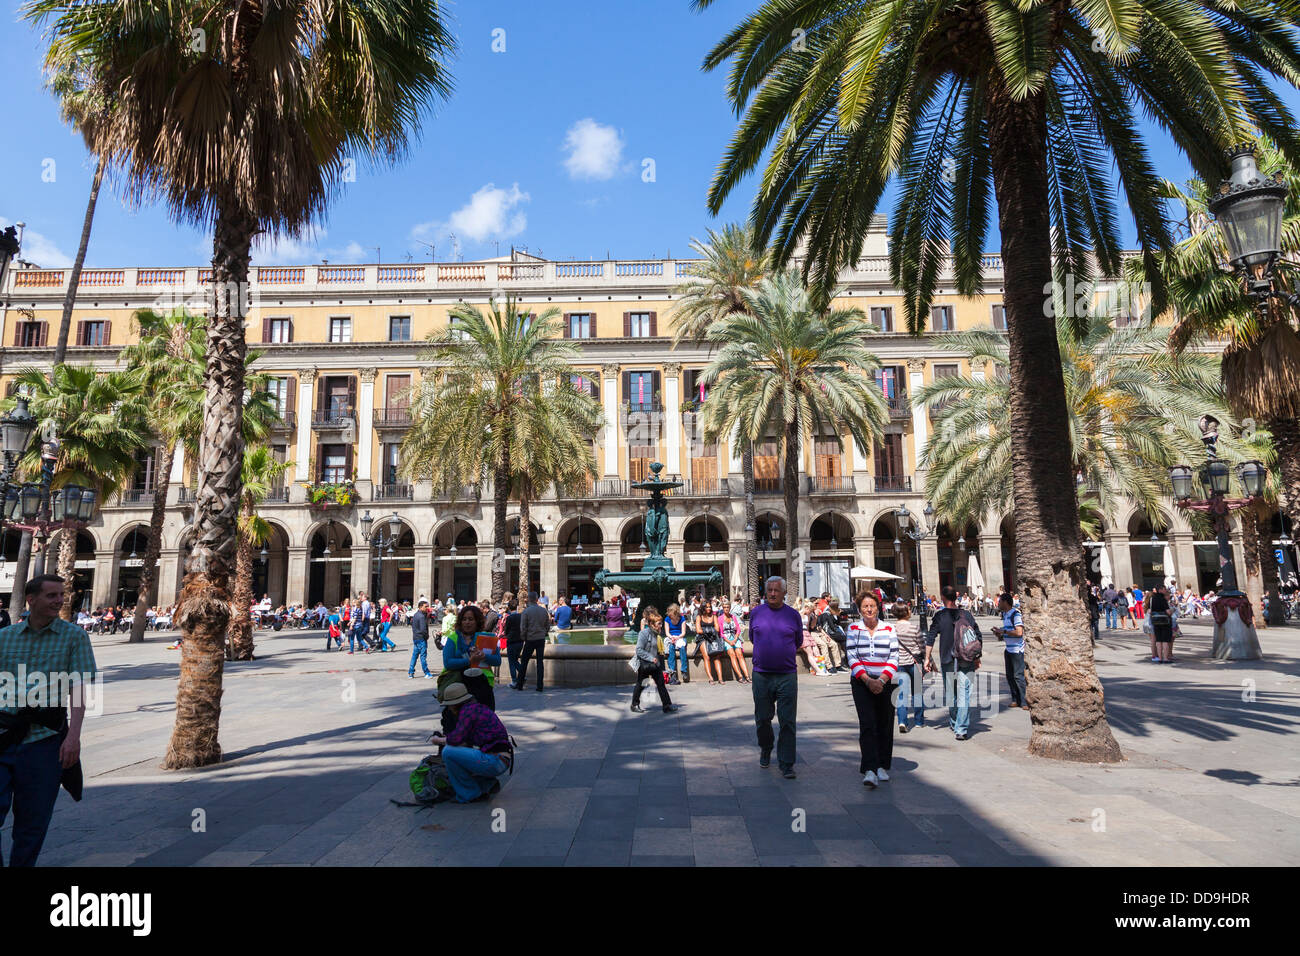 Placa Reial off La Rambla Barcelona - Stock Image